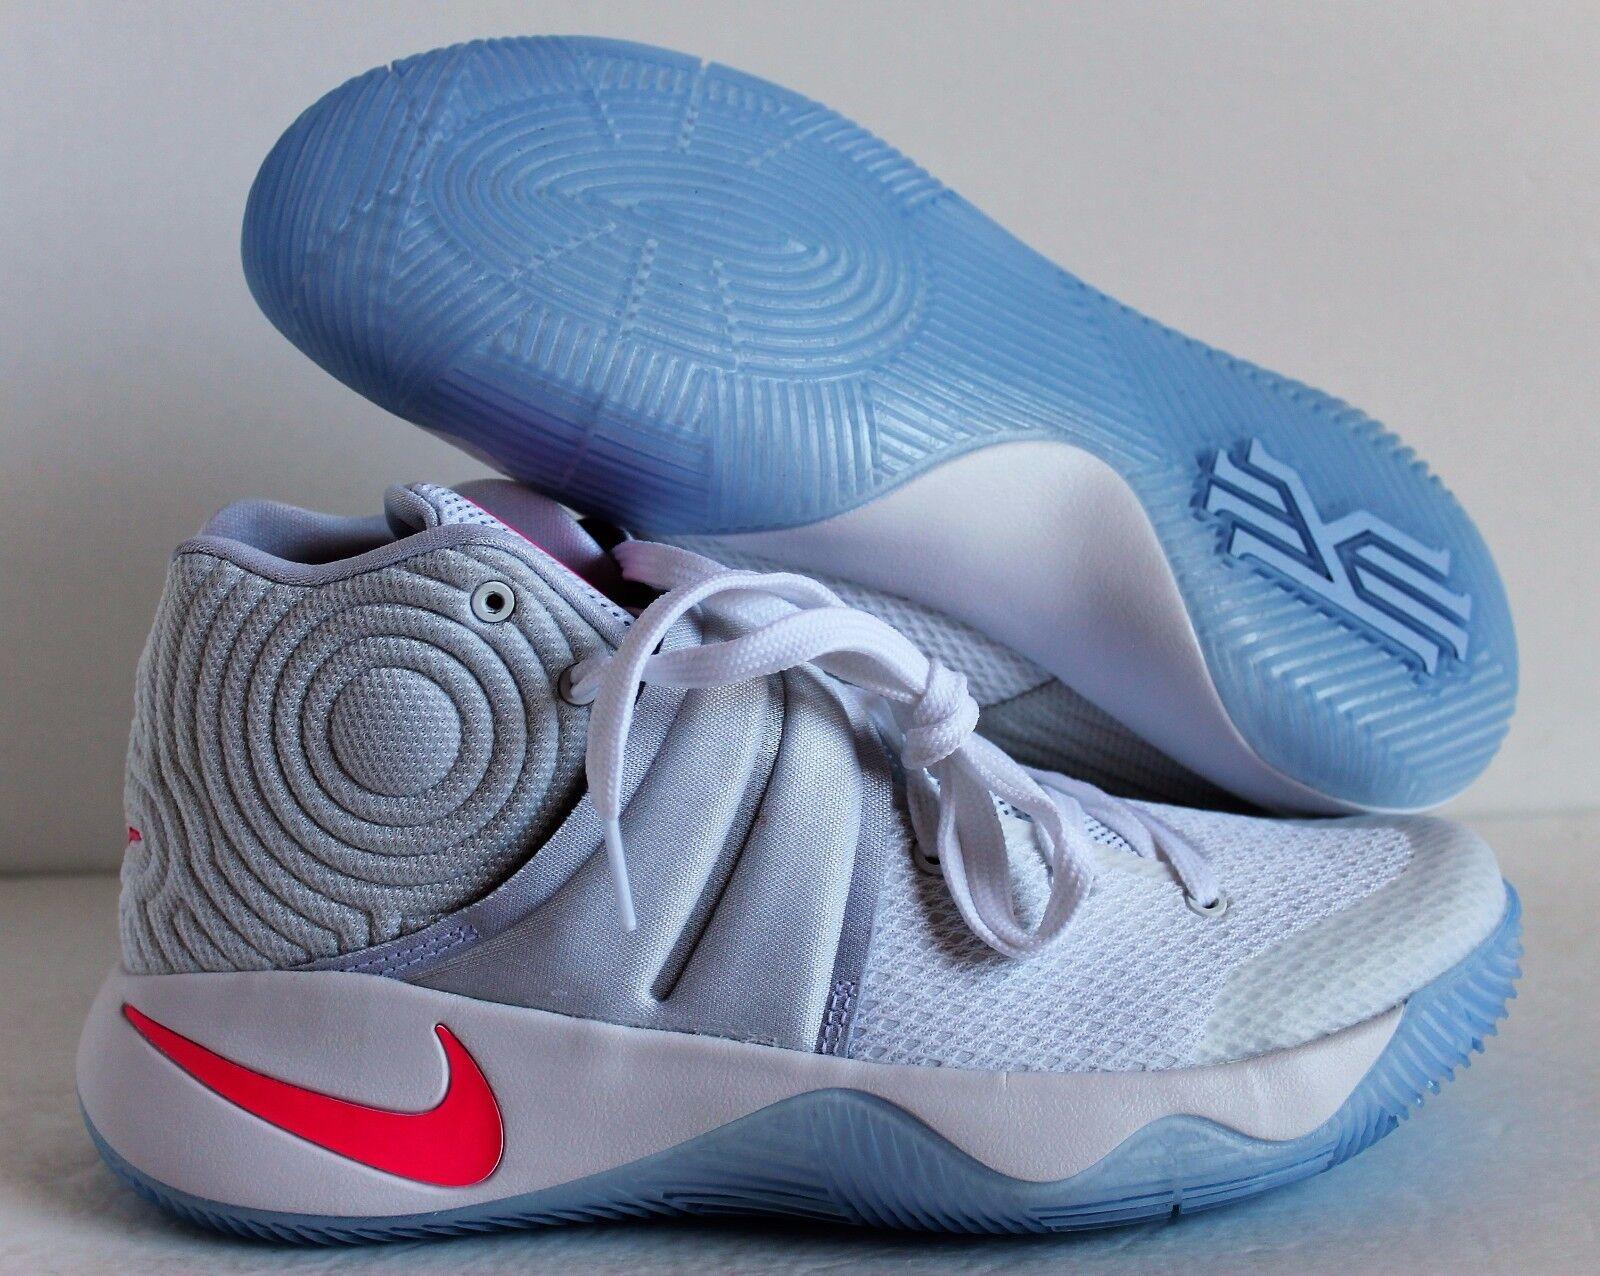 Nike Women's Kyrie 2 ID White-Pink  SZ 9.5 [843254-997]